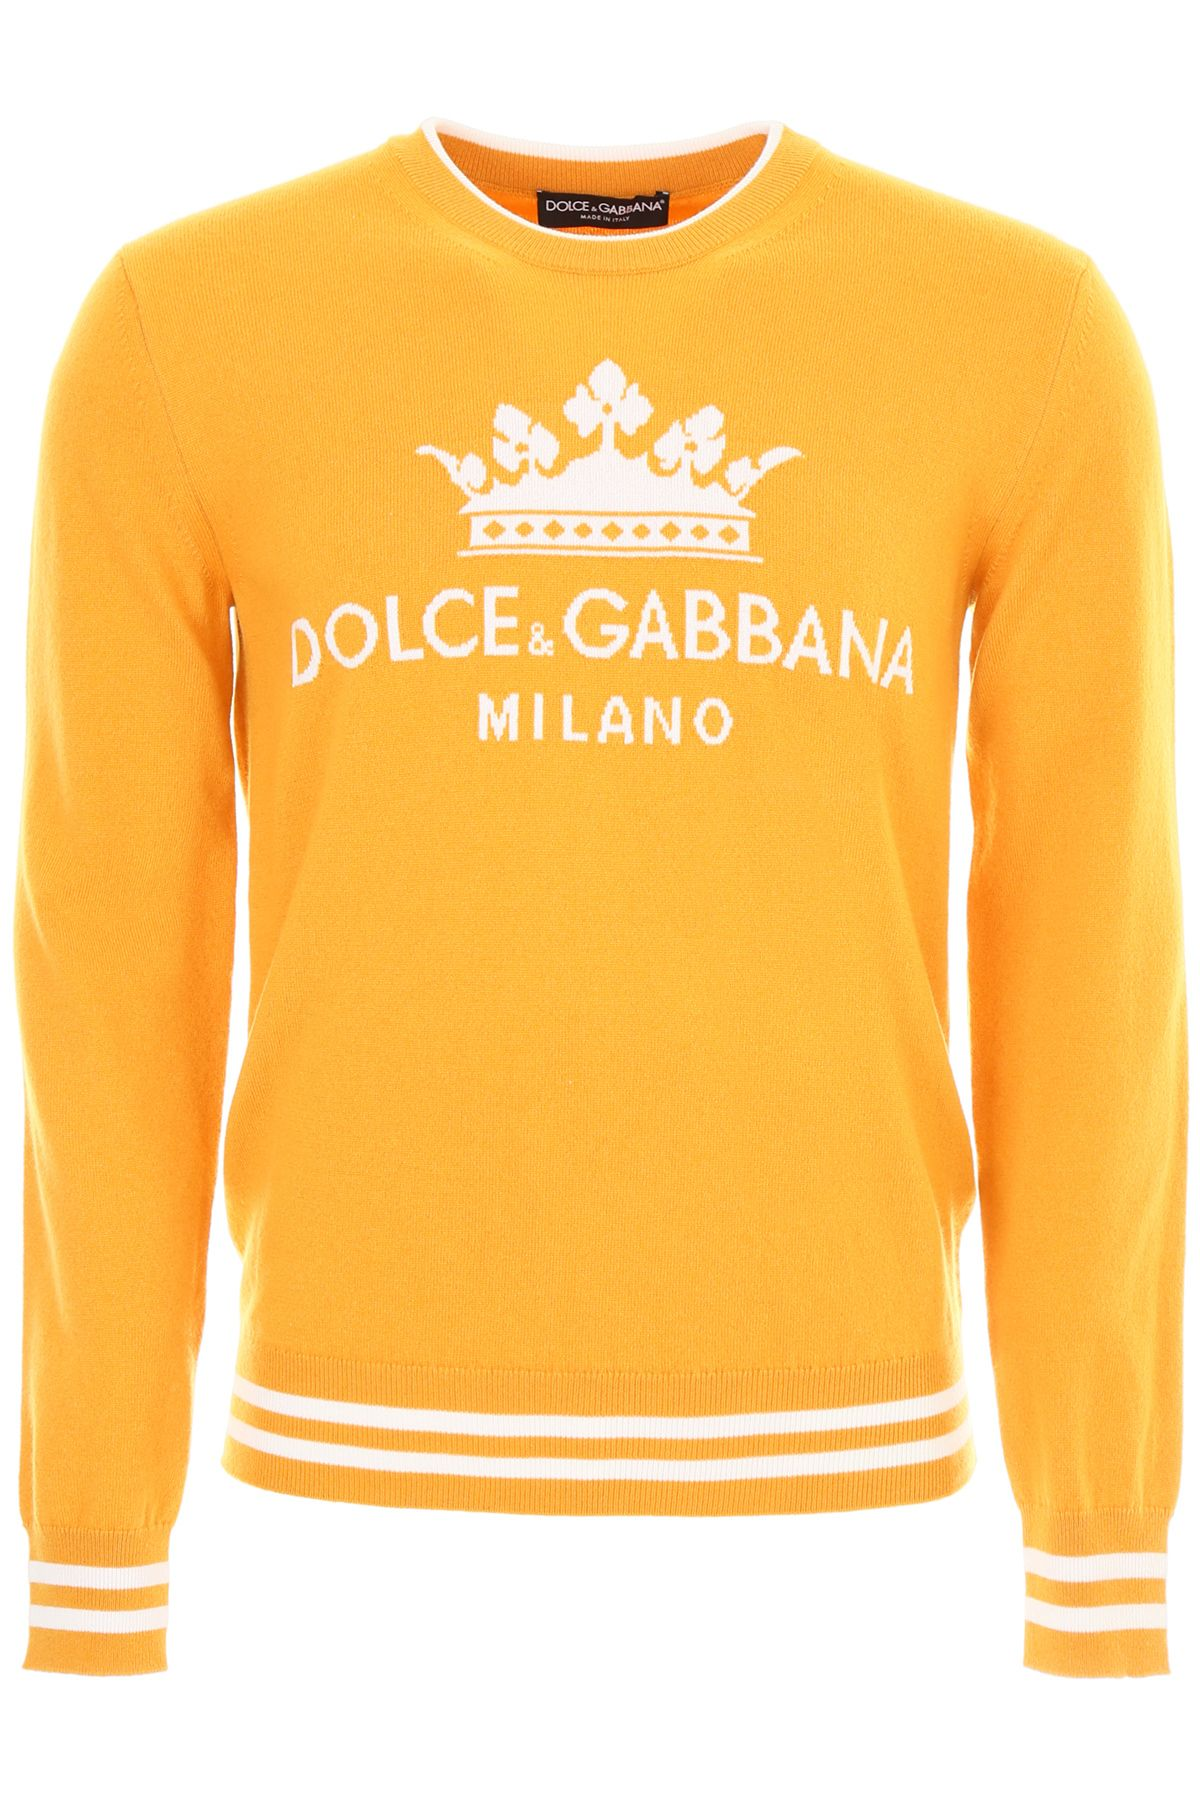 Dolce & Gabbana Crown Intarsia Pullover